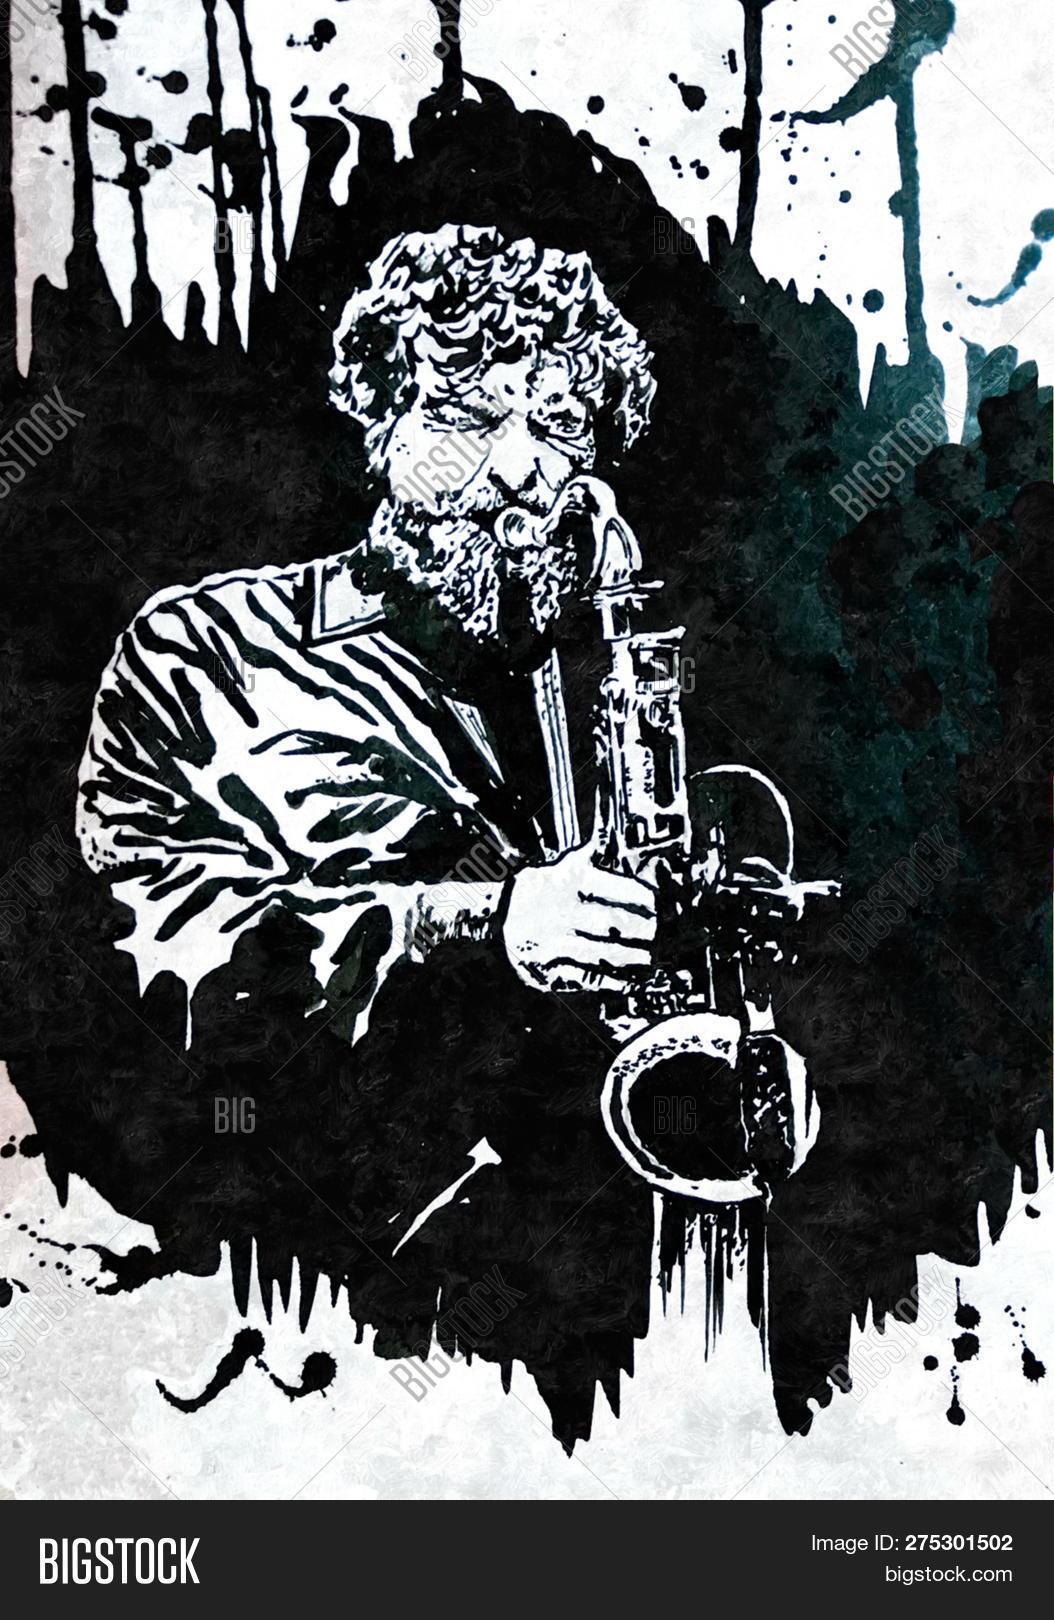 Saxophonist Jazz Band Image Photo Free Trial Bigstock